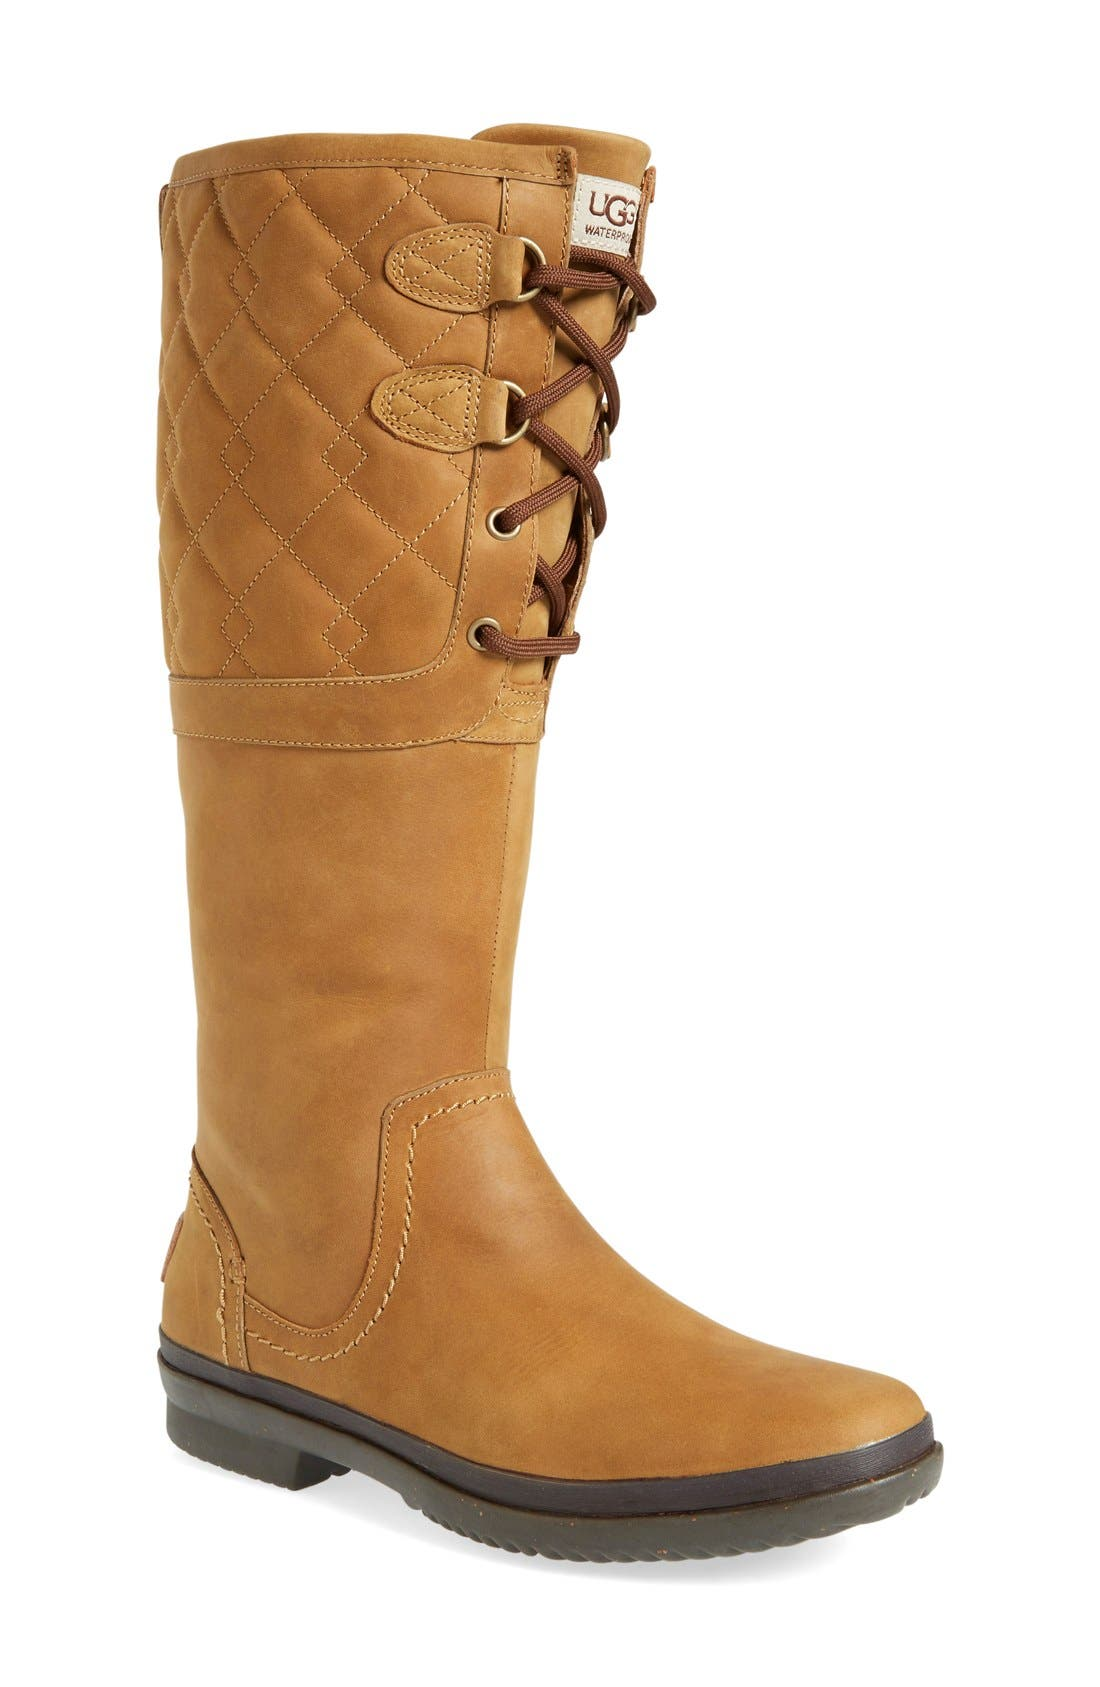 Main Image - UGG® Elsa Quilted Waterproof Boot (Women)